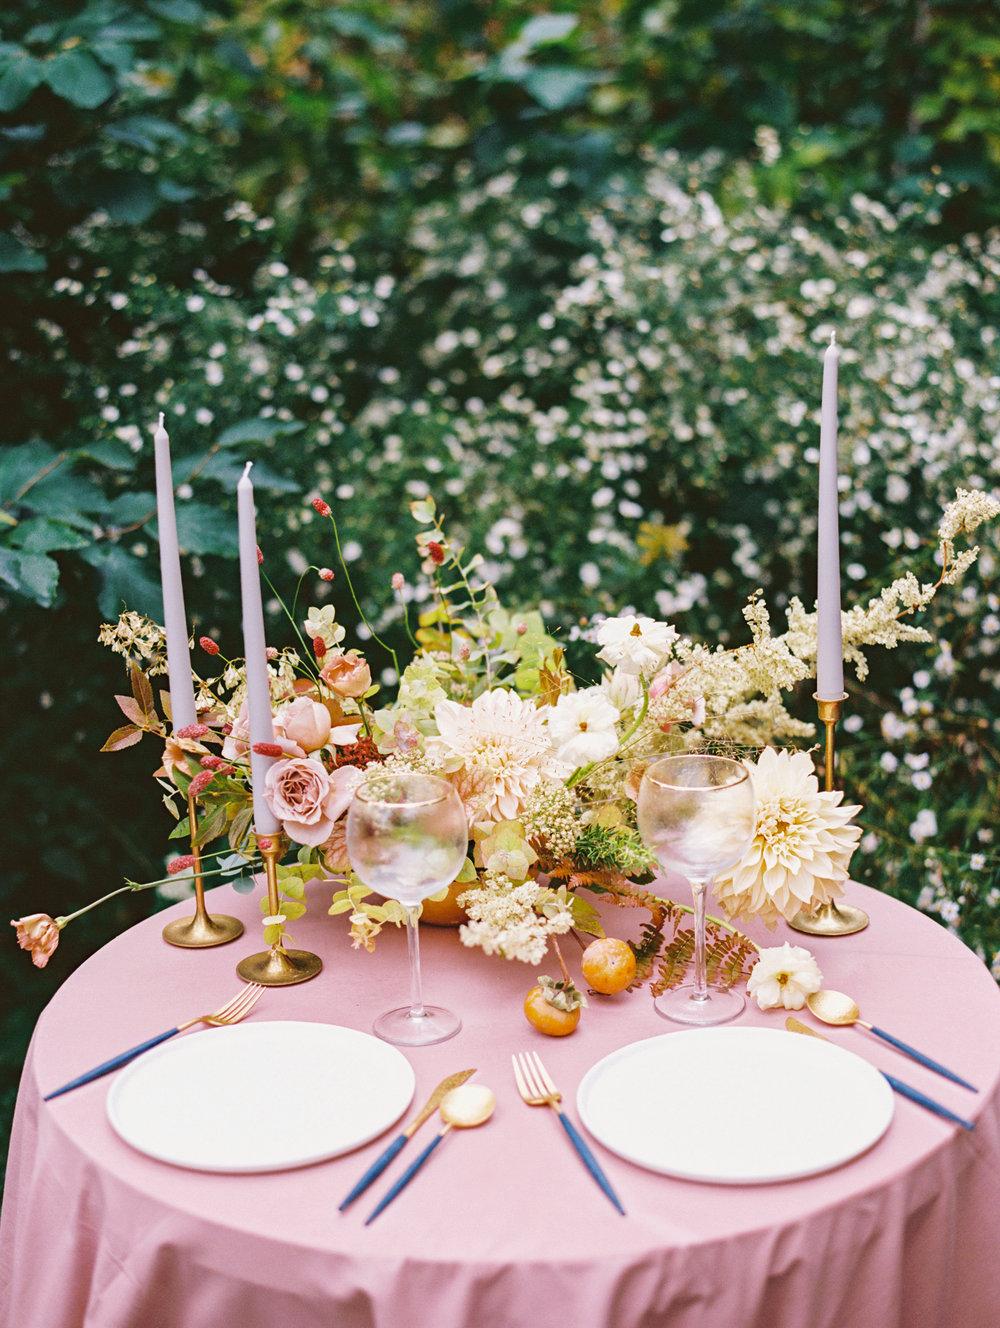 kelsandmichael_bridaleditorial_harvestelopement-10.jpg